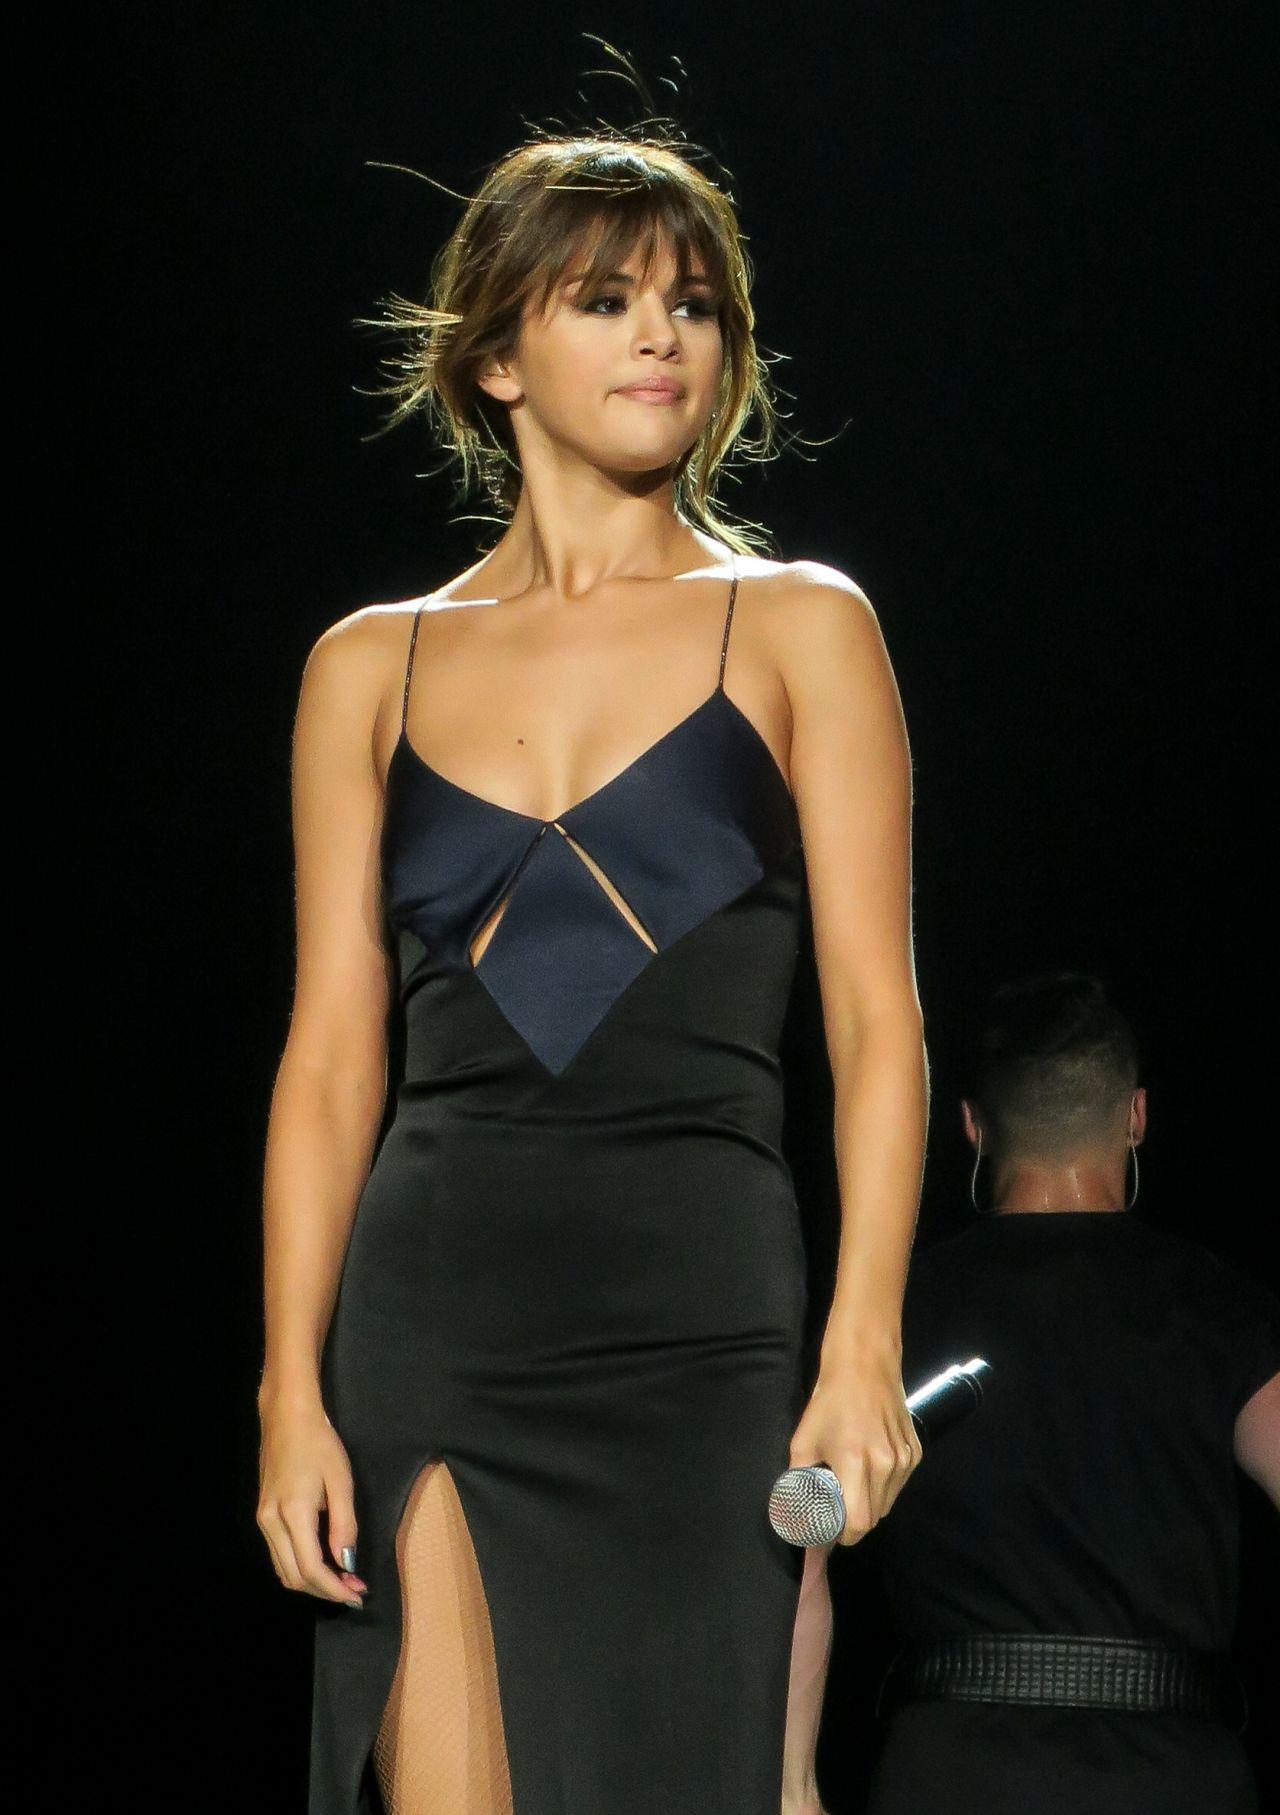 fbe188d4f2190 Selena Gomez – Os looks da Revival Tour. – Júlia Azambuja